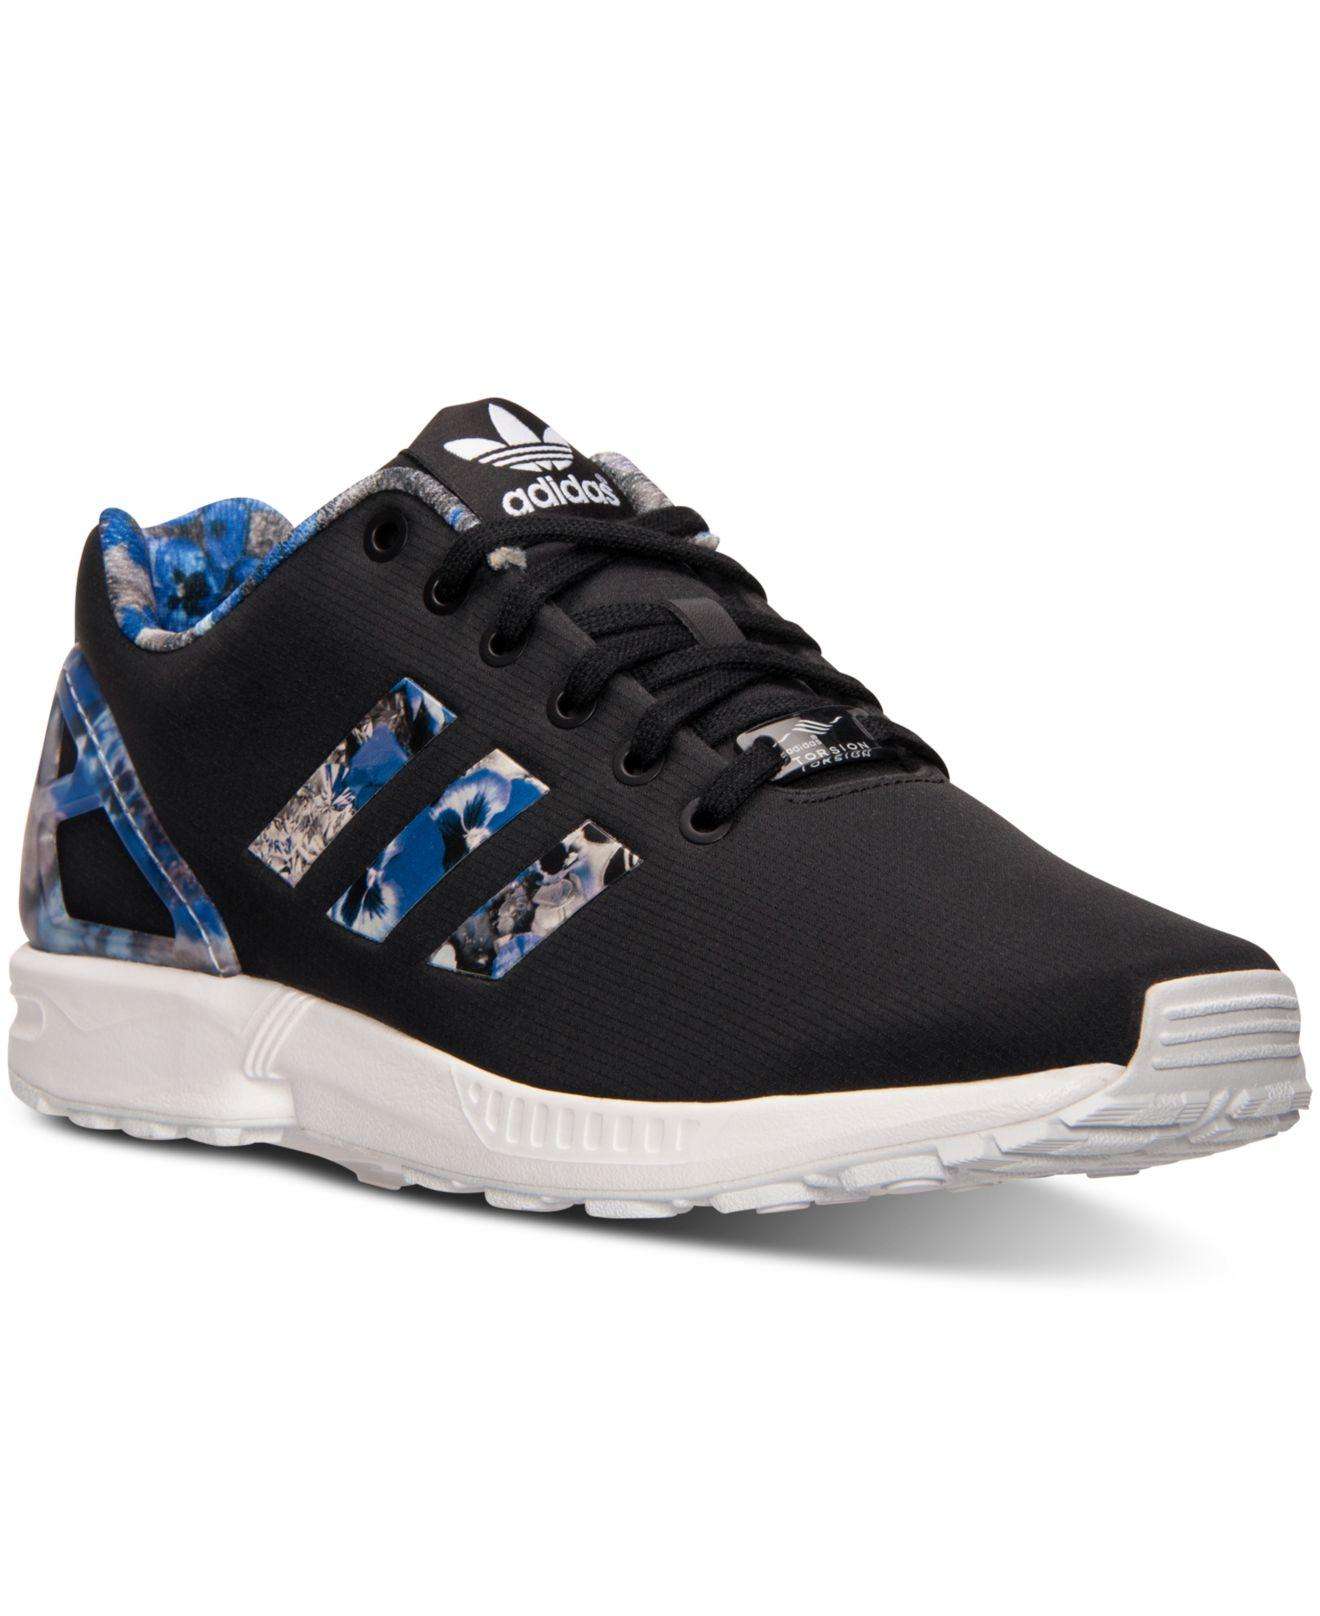 dc1cd6439 Lyst - adidas Originals Men s Zx Flux Print Running Sneakers From ...